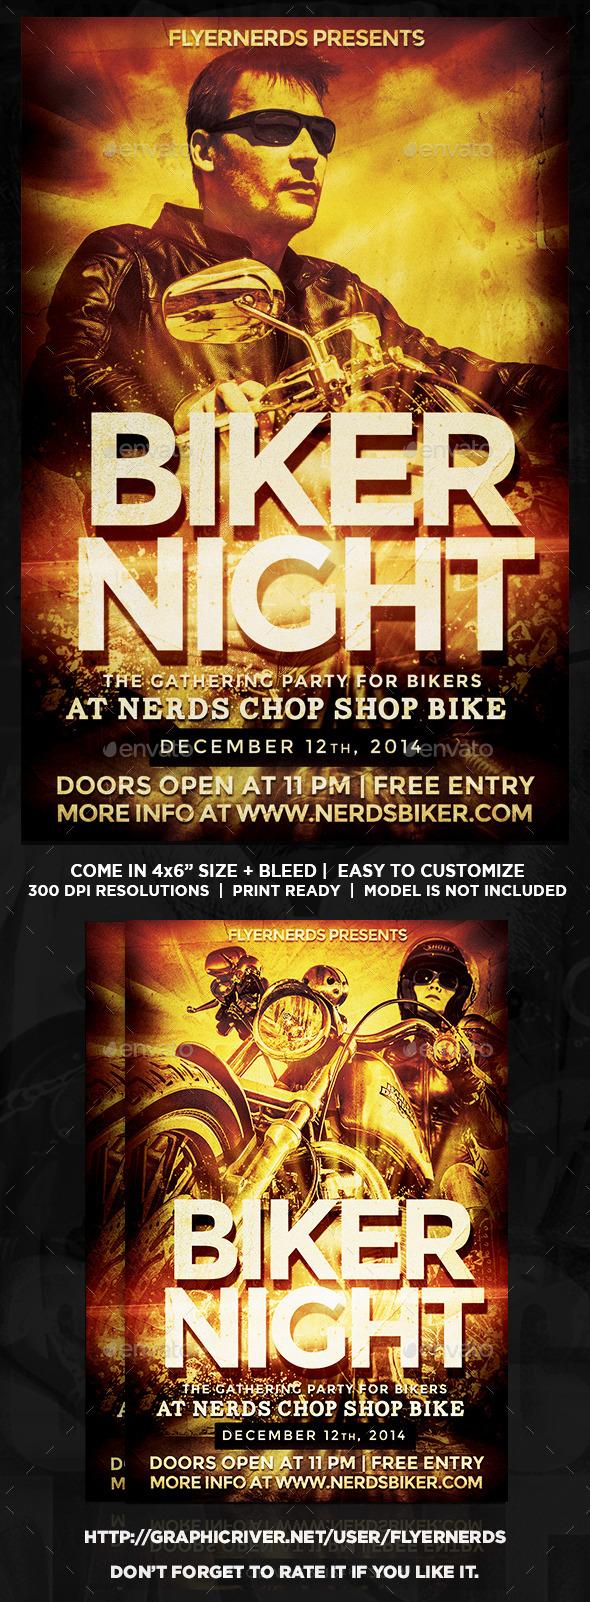 biker event poster samples stock photos graphics. Black Bedroom Furniture Sets. Home Design Ideas